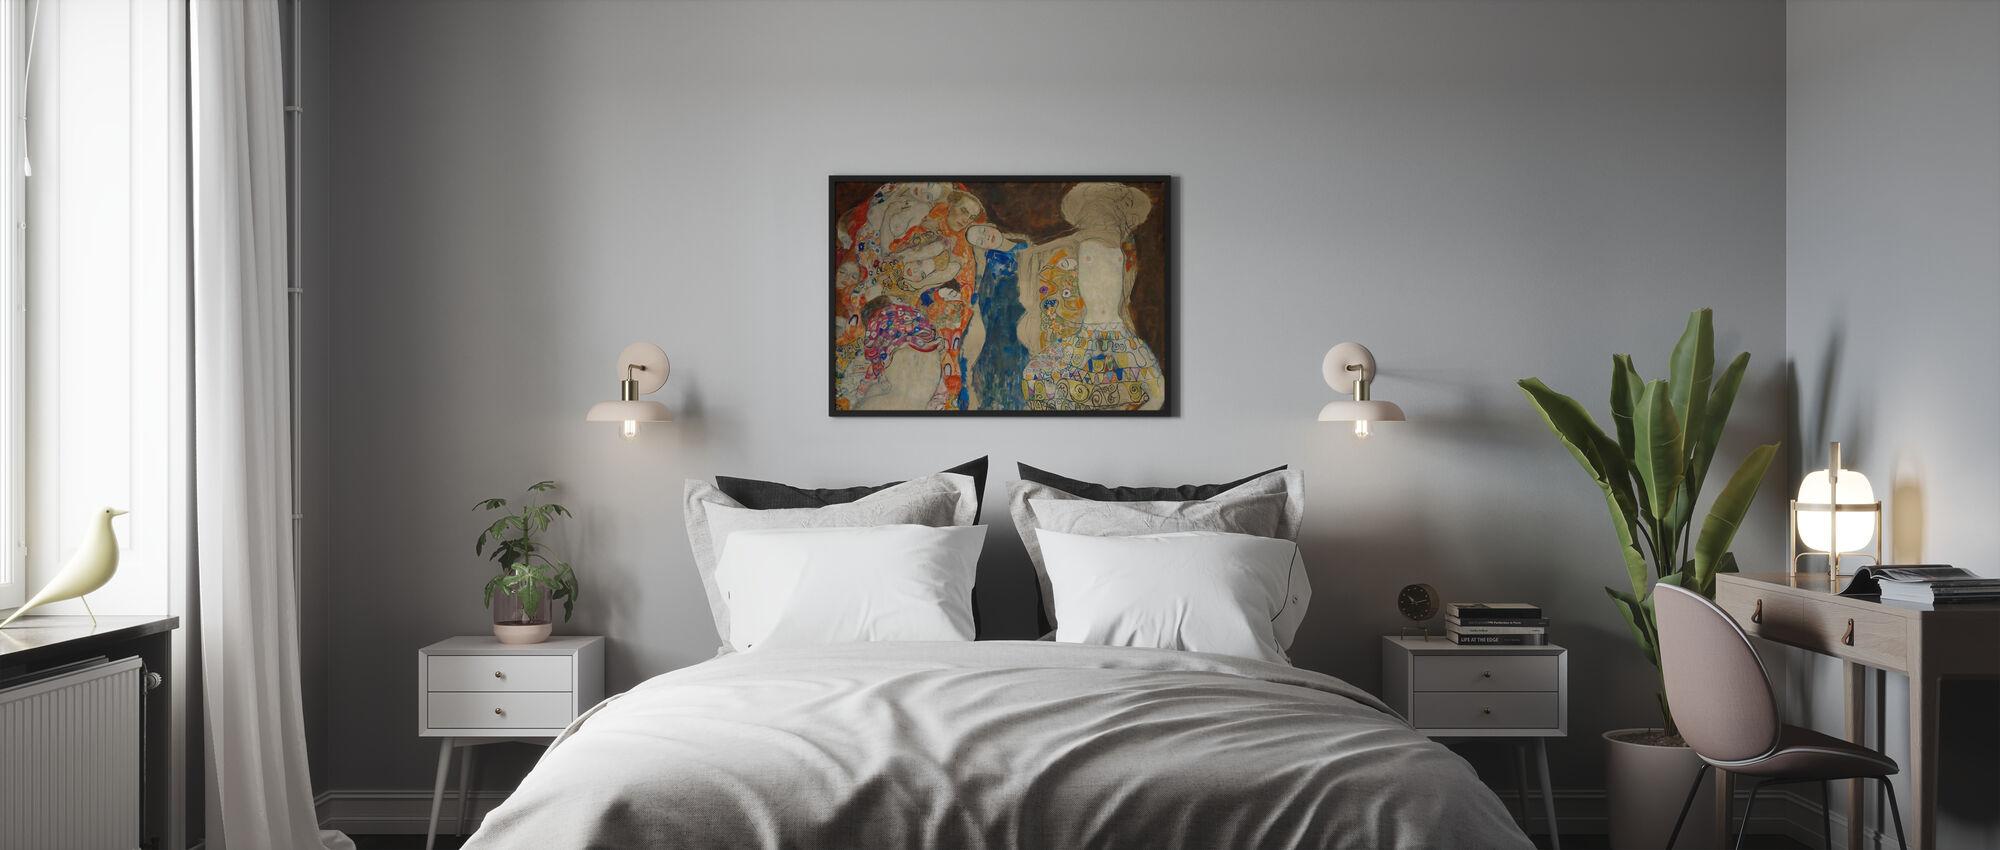 Brud - Gustav Klimt - Innrammet bilde - Soverom